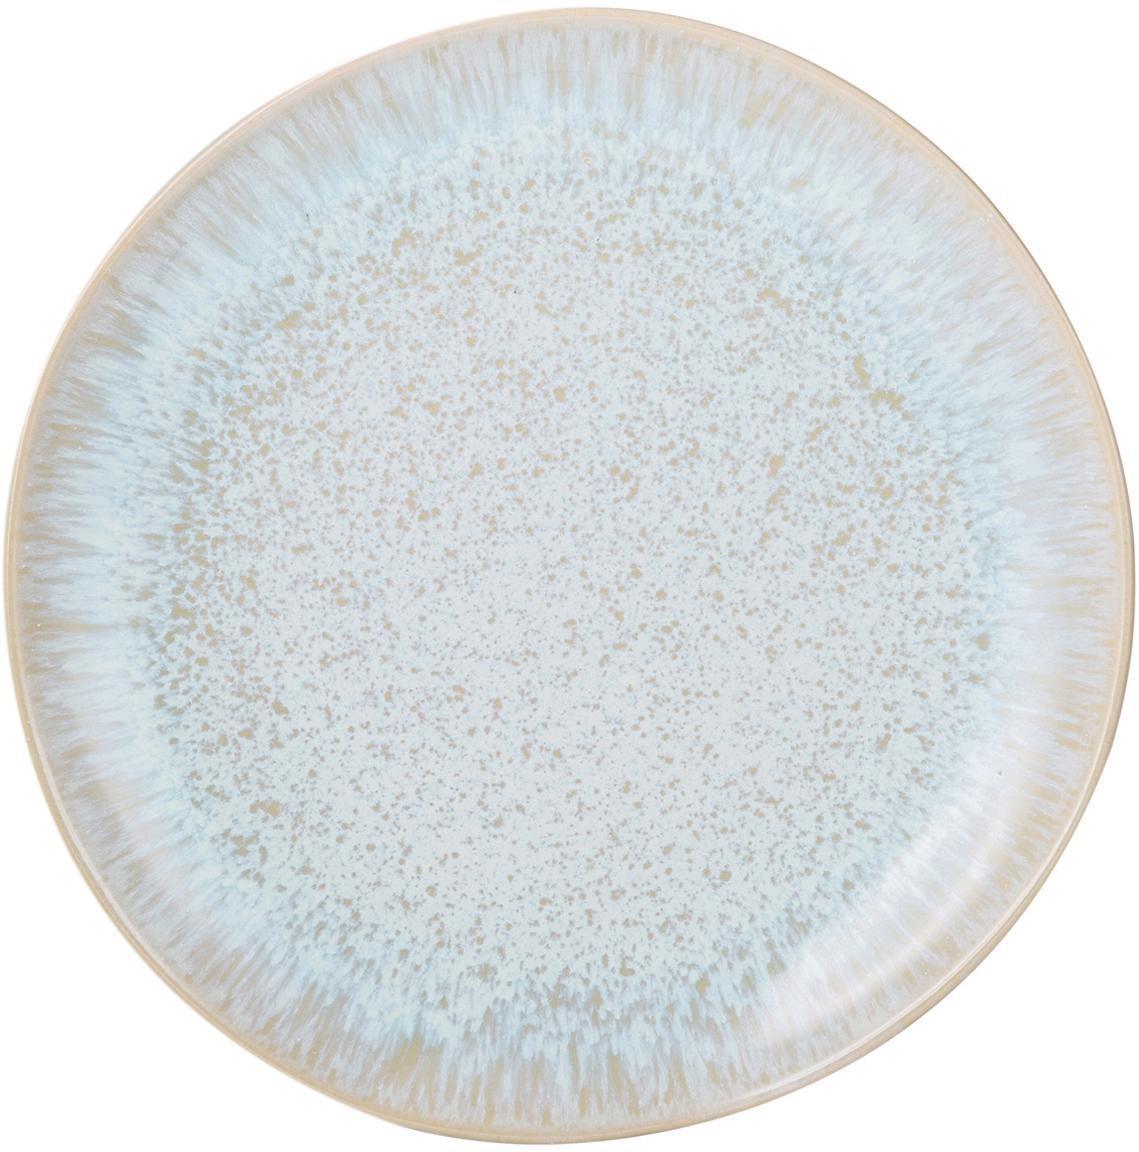 Handgeschilderde ontbijtborden Areia, 2 stuks, Keramiek, Lichtblauw, gebroken wit, lichtbeige, Ø 22 cm